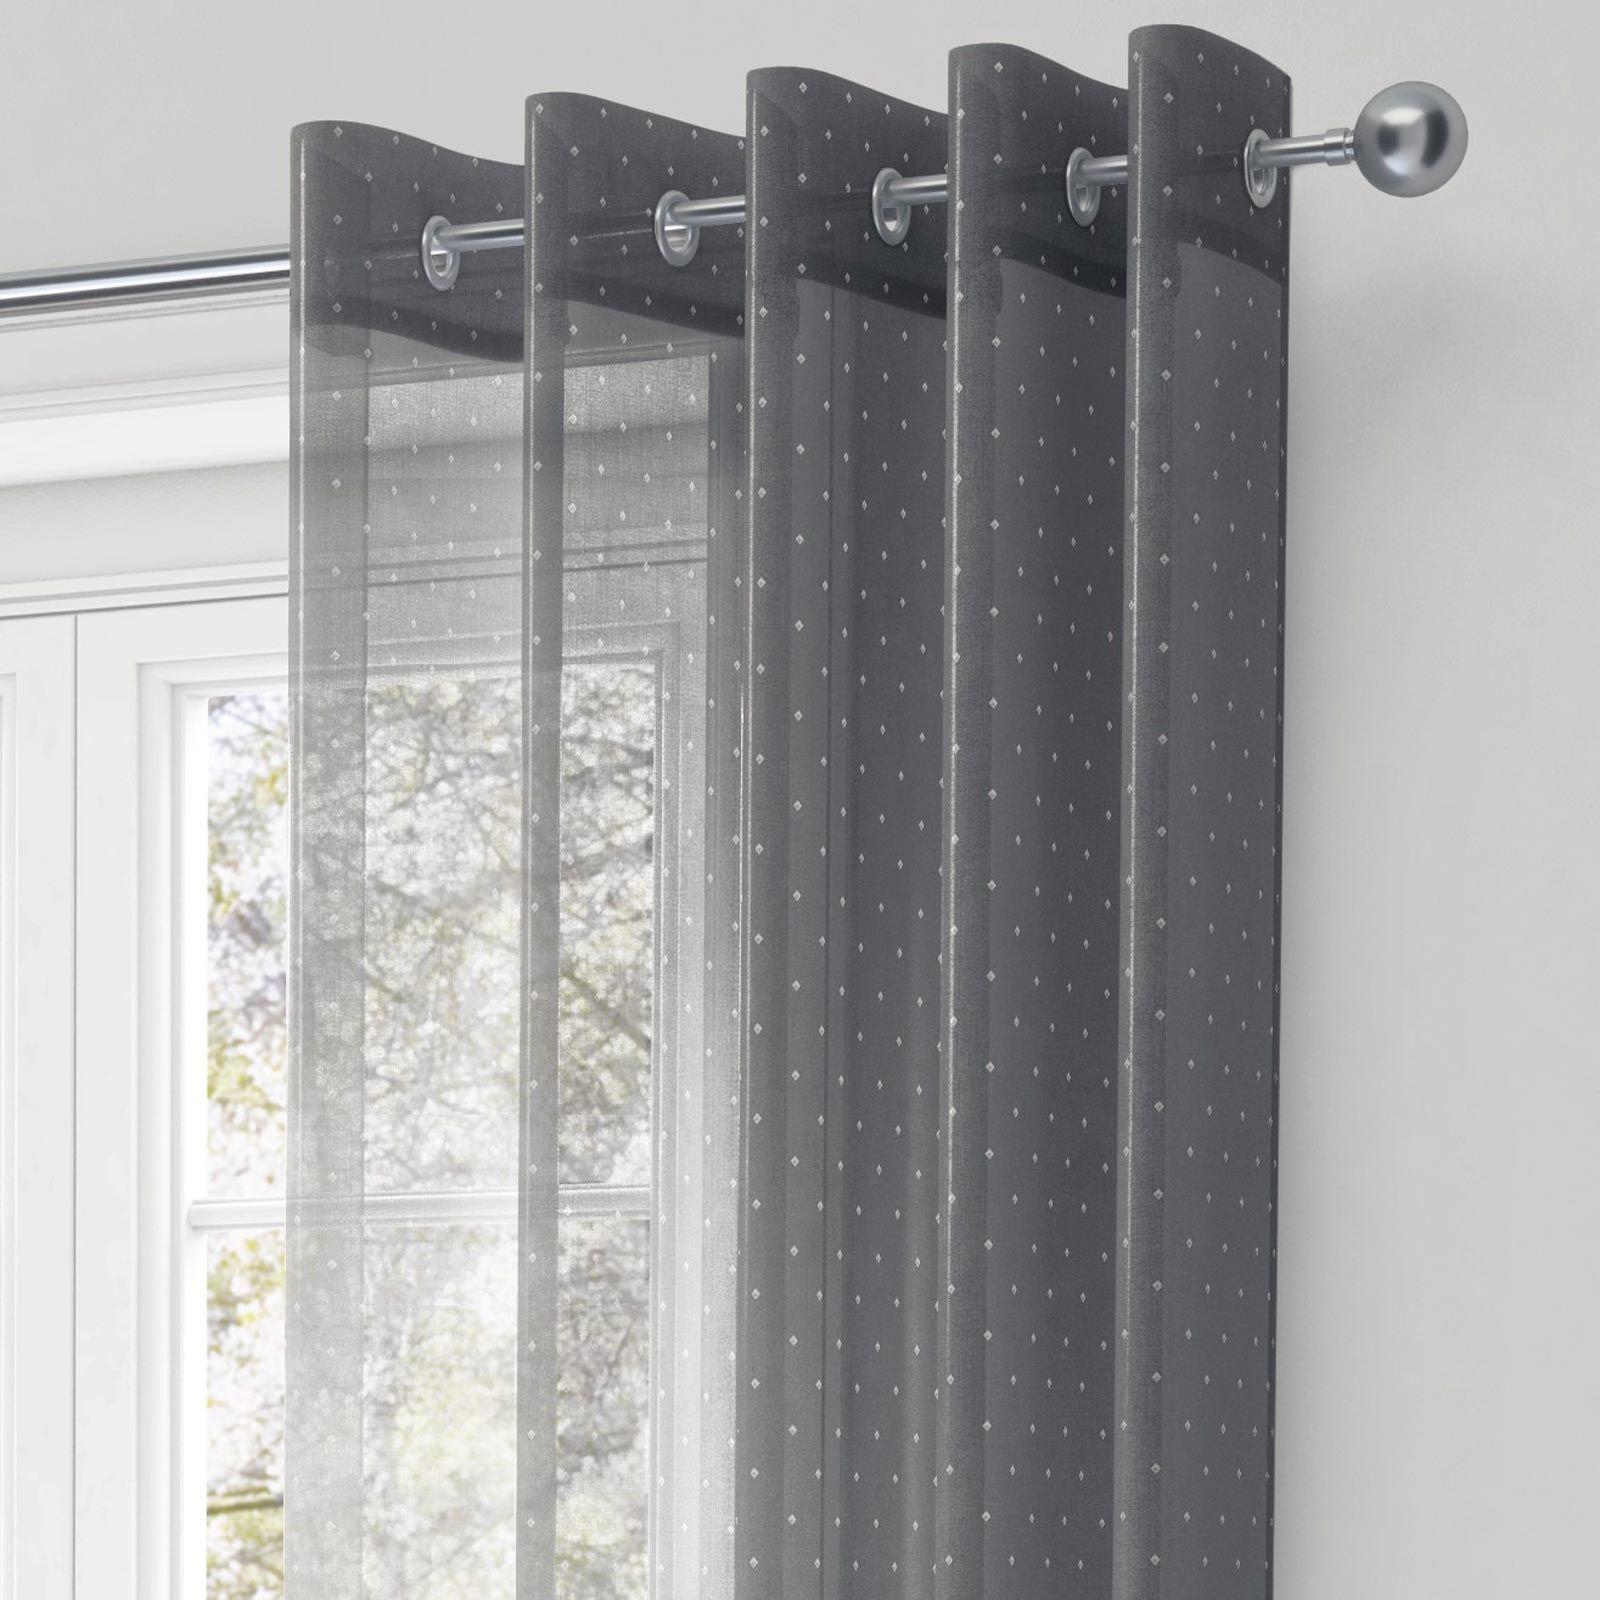 photos voile shiny ideas and sheer eyelet impressive curtain curtains weave panel ukvoile uk white silver